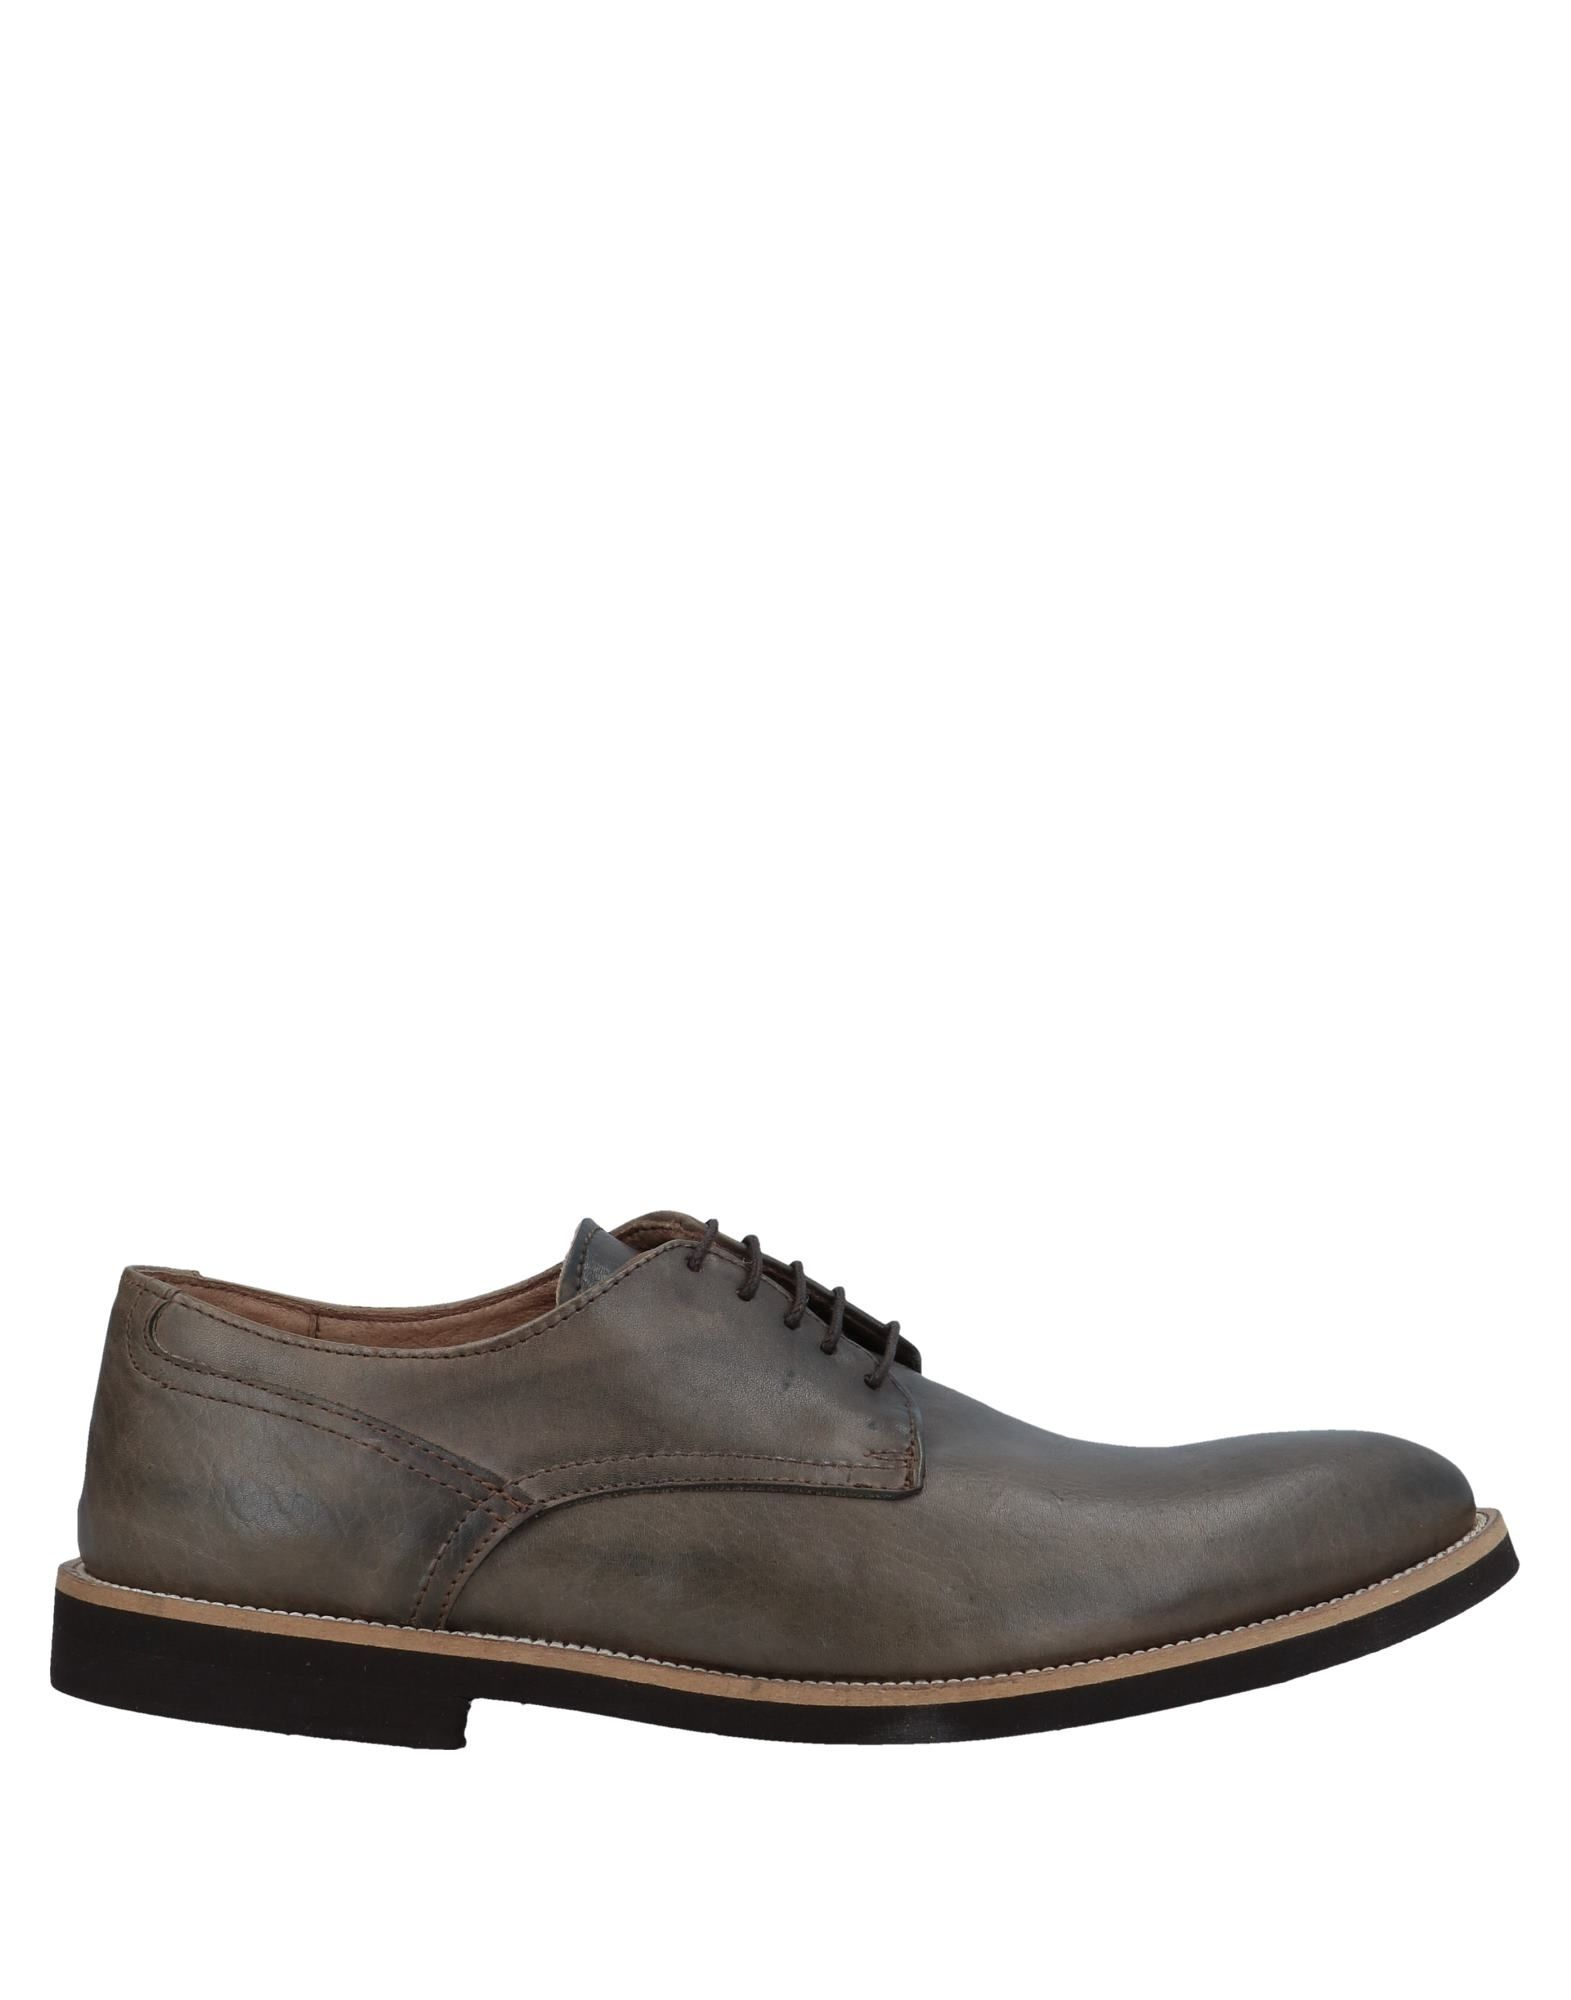 Rabatt echte Schuhe Marc May Schnürschuhe Herren  11555870BL